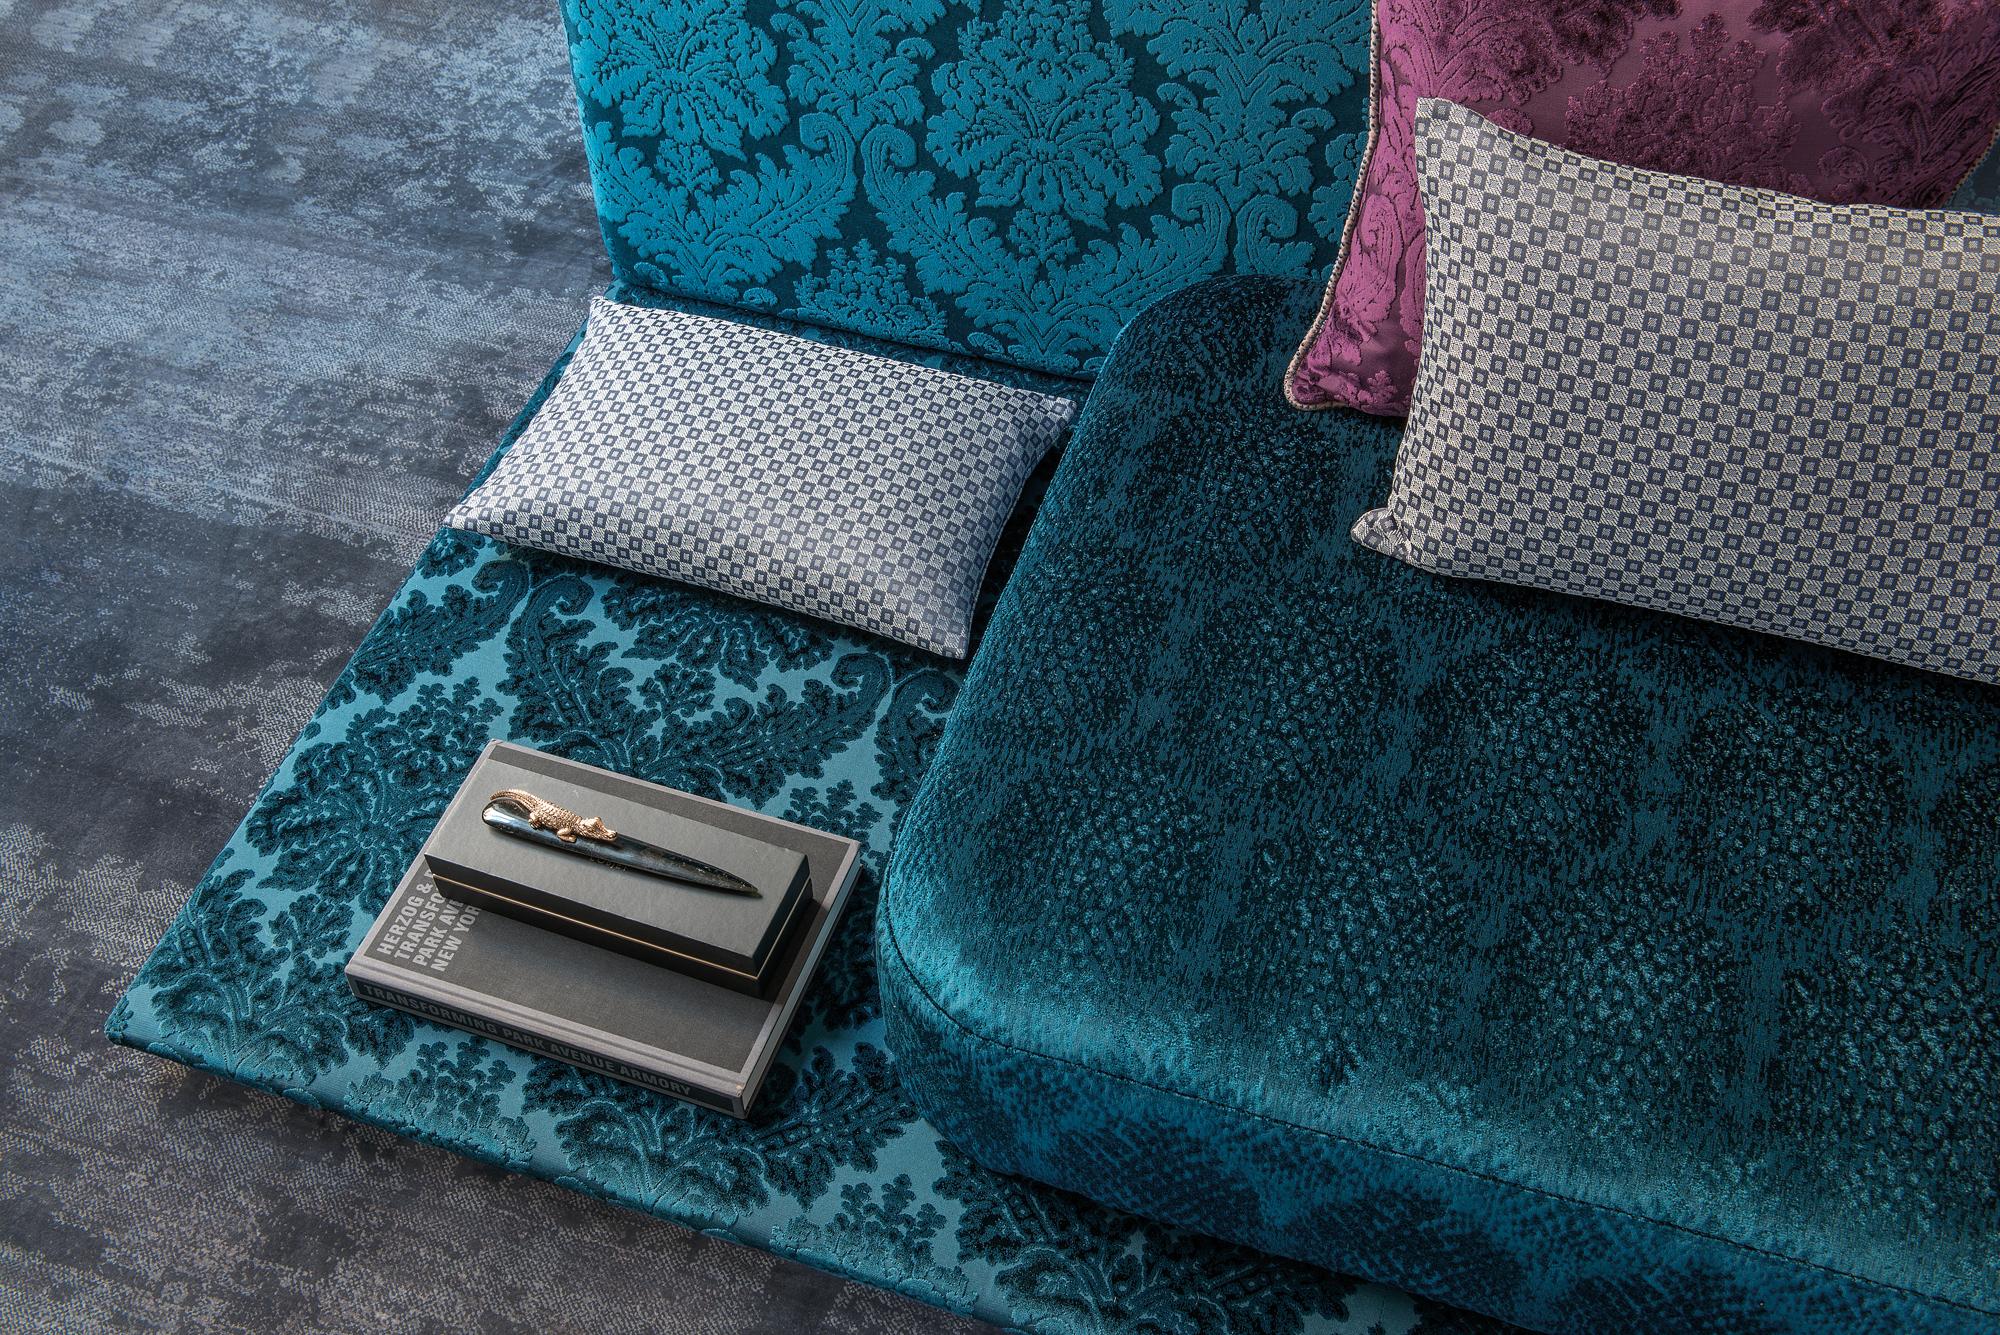 Luxurious vibrant textures